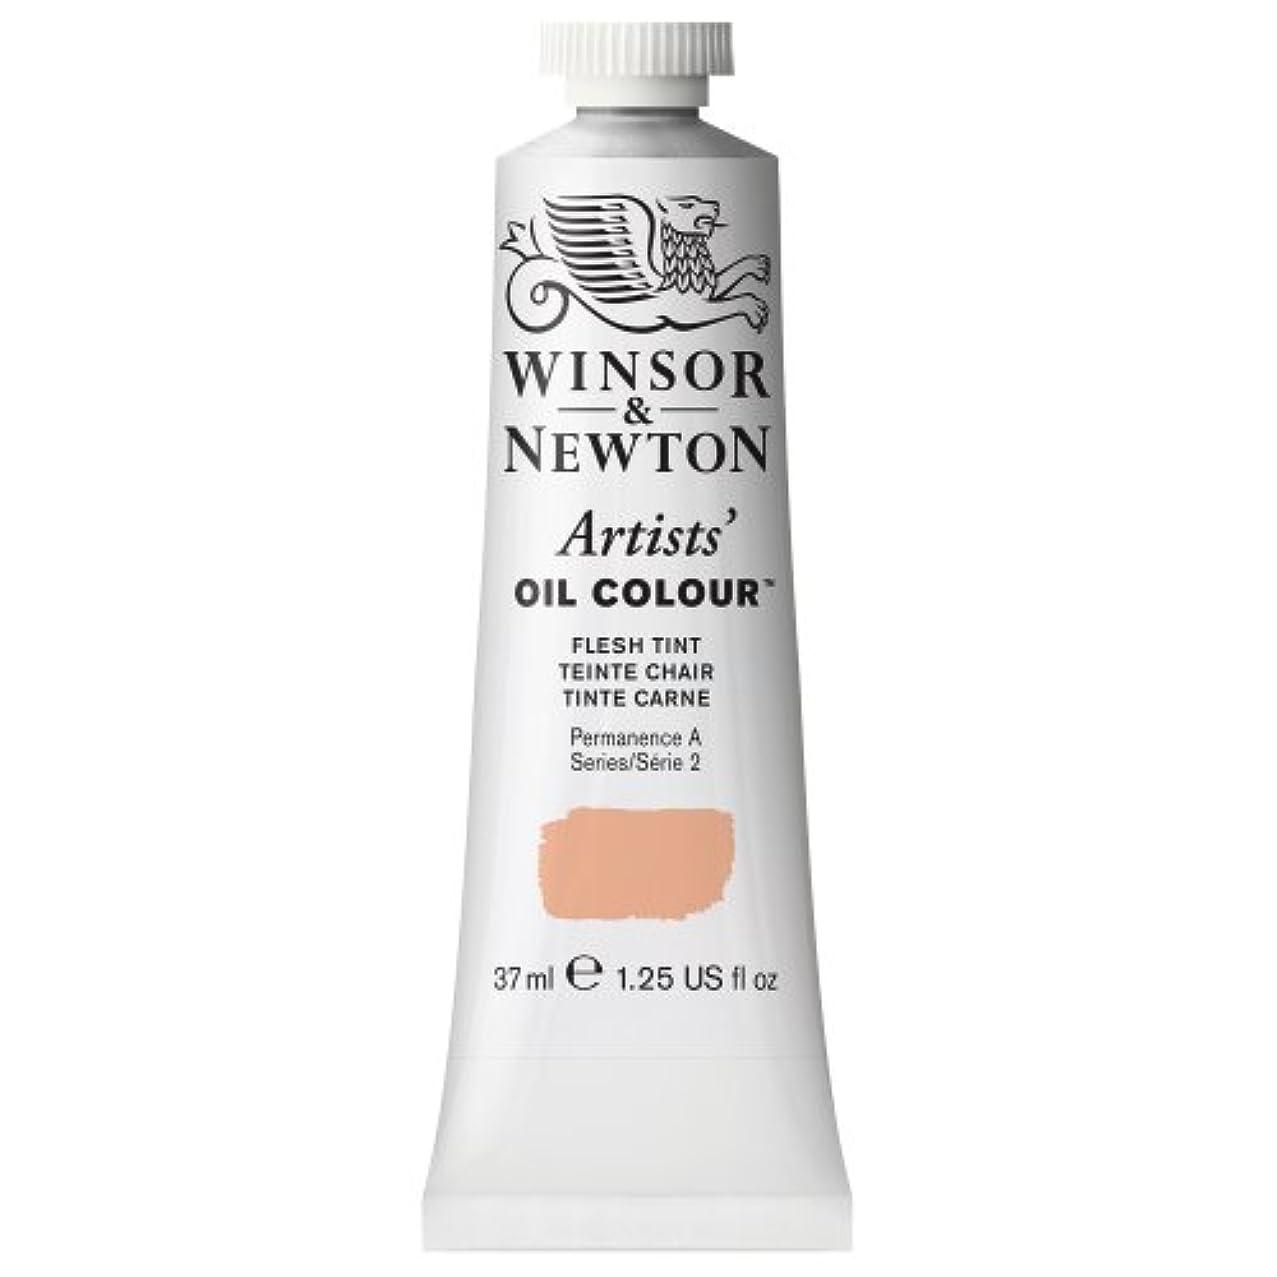 Winsor & Newton Artists' Oil Colour Paint, 37ml Tube, Flesh Tint